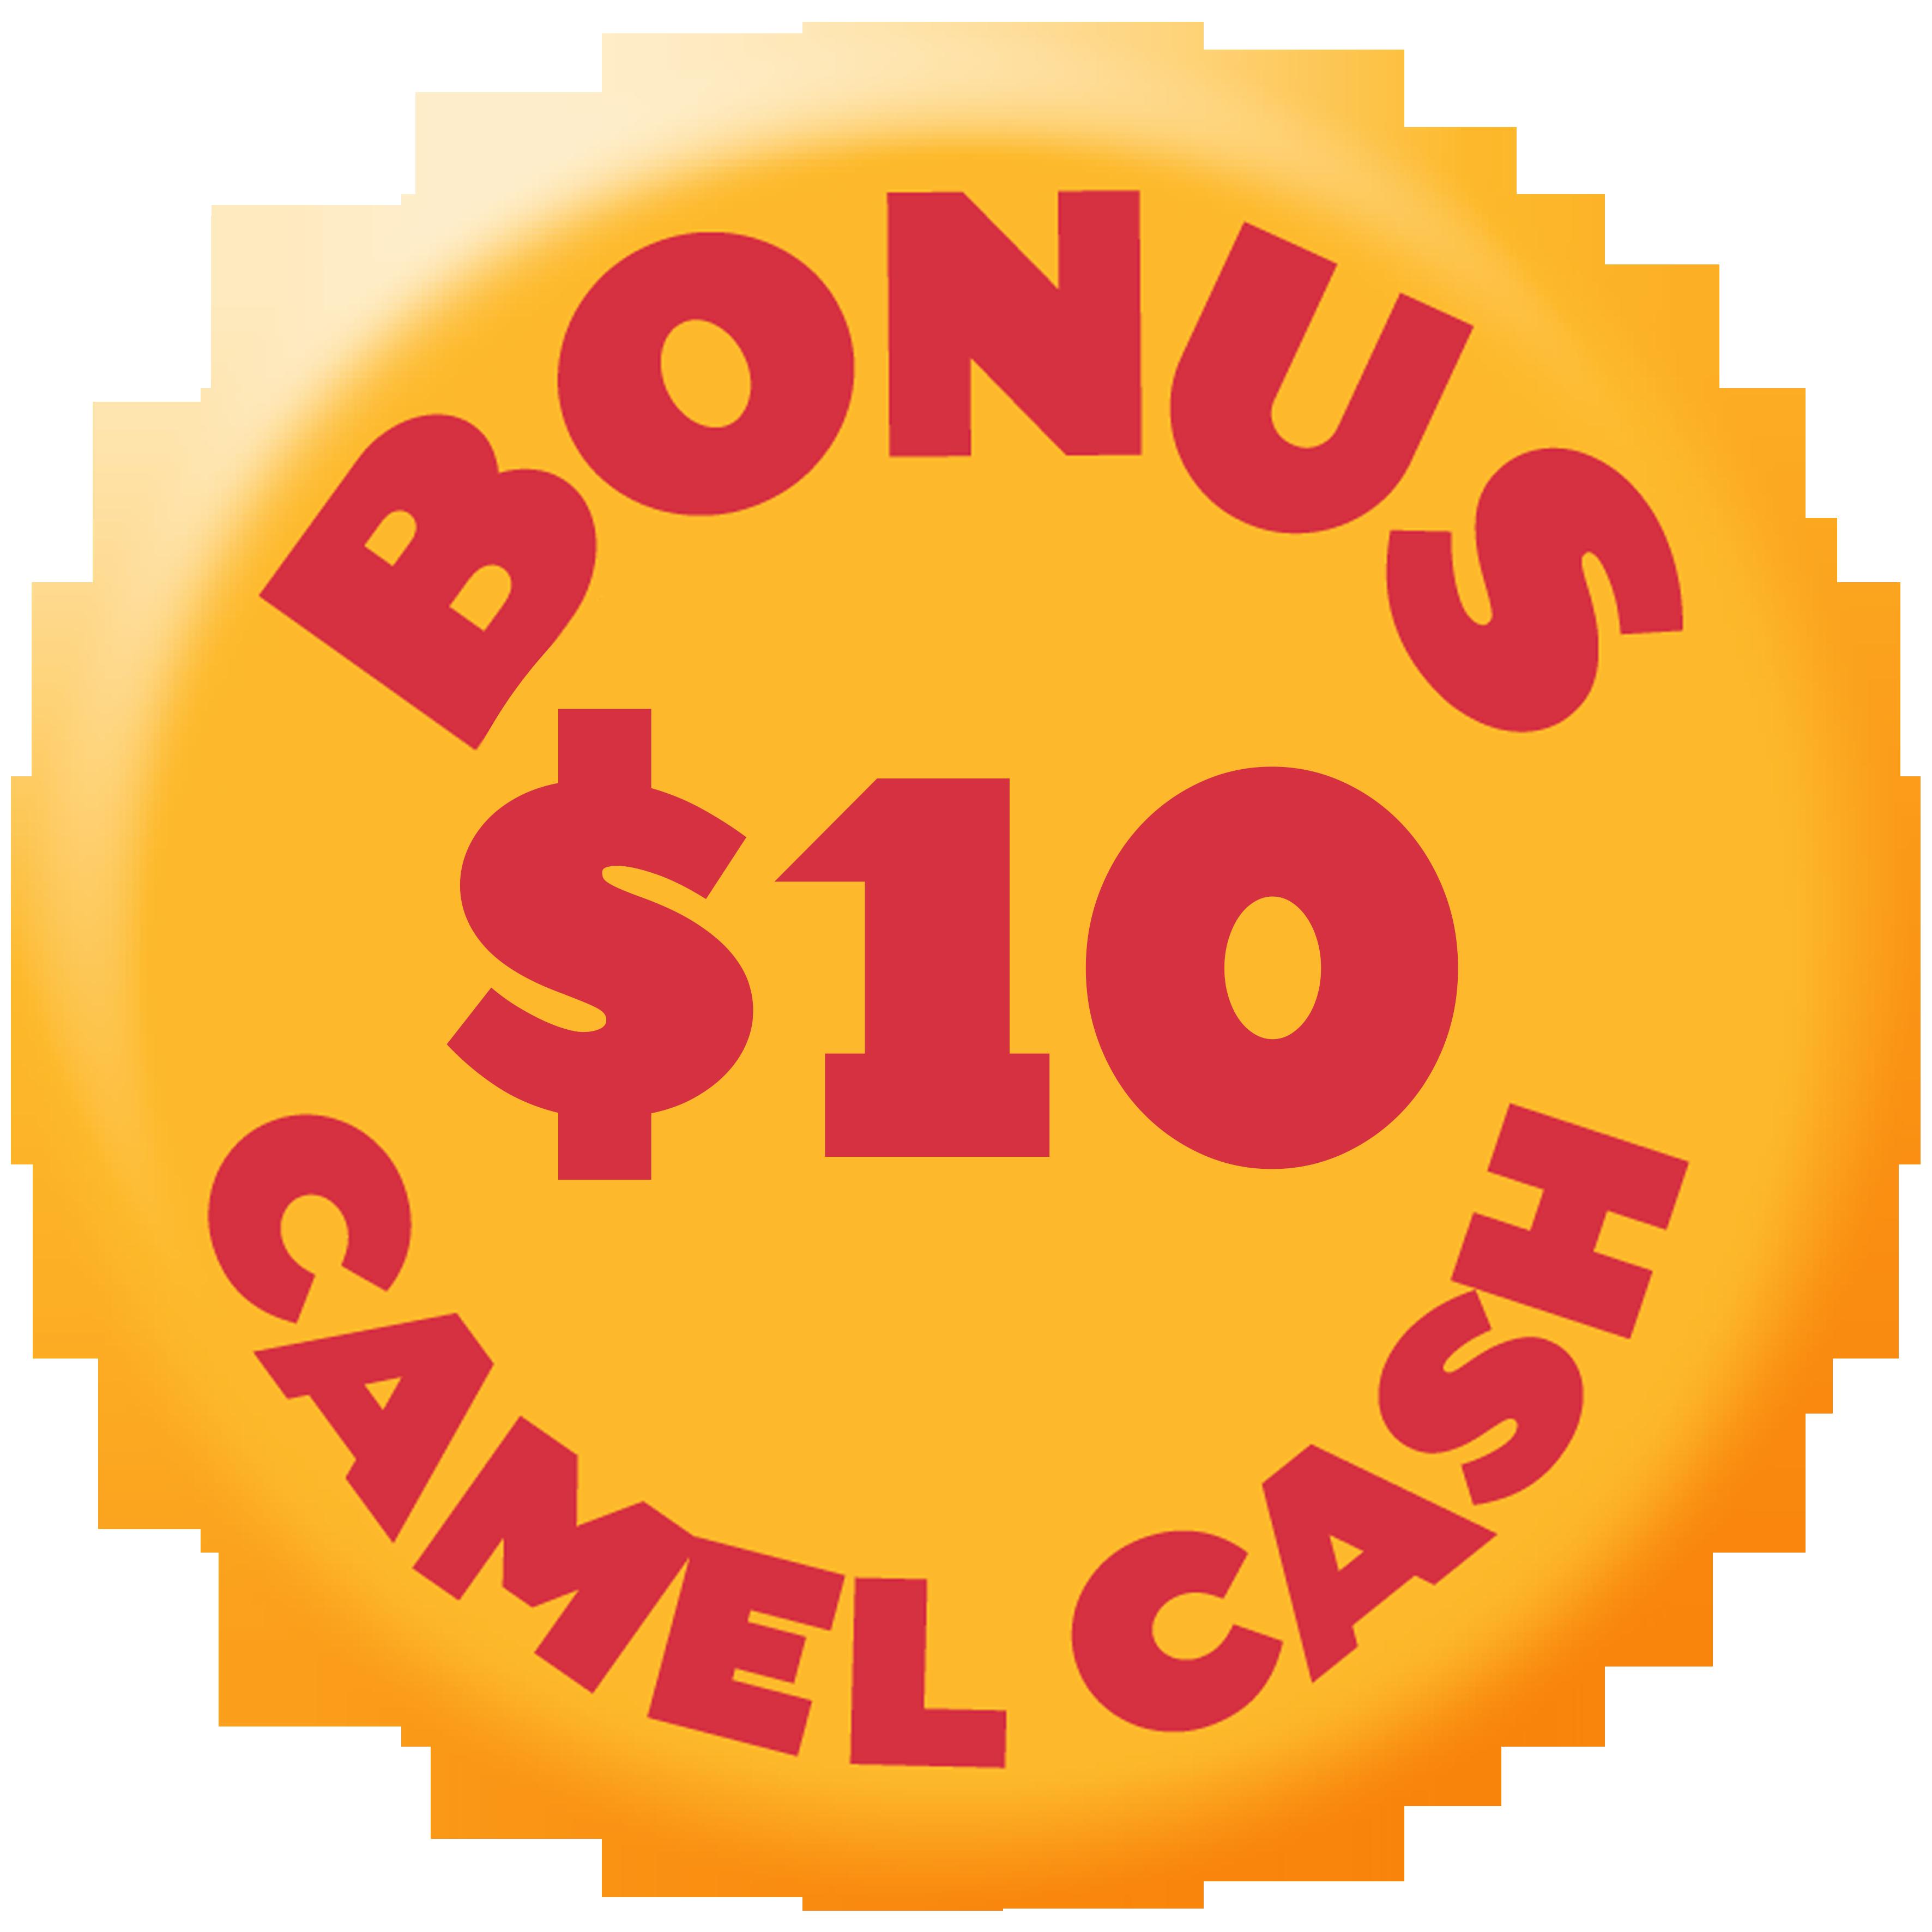 Bonus $10 Camel Cash